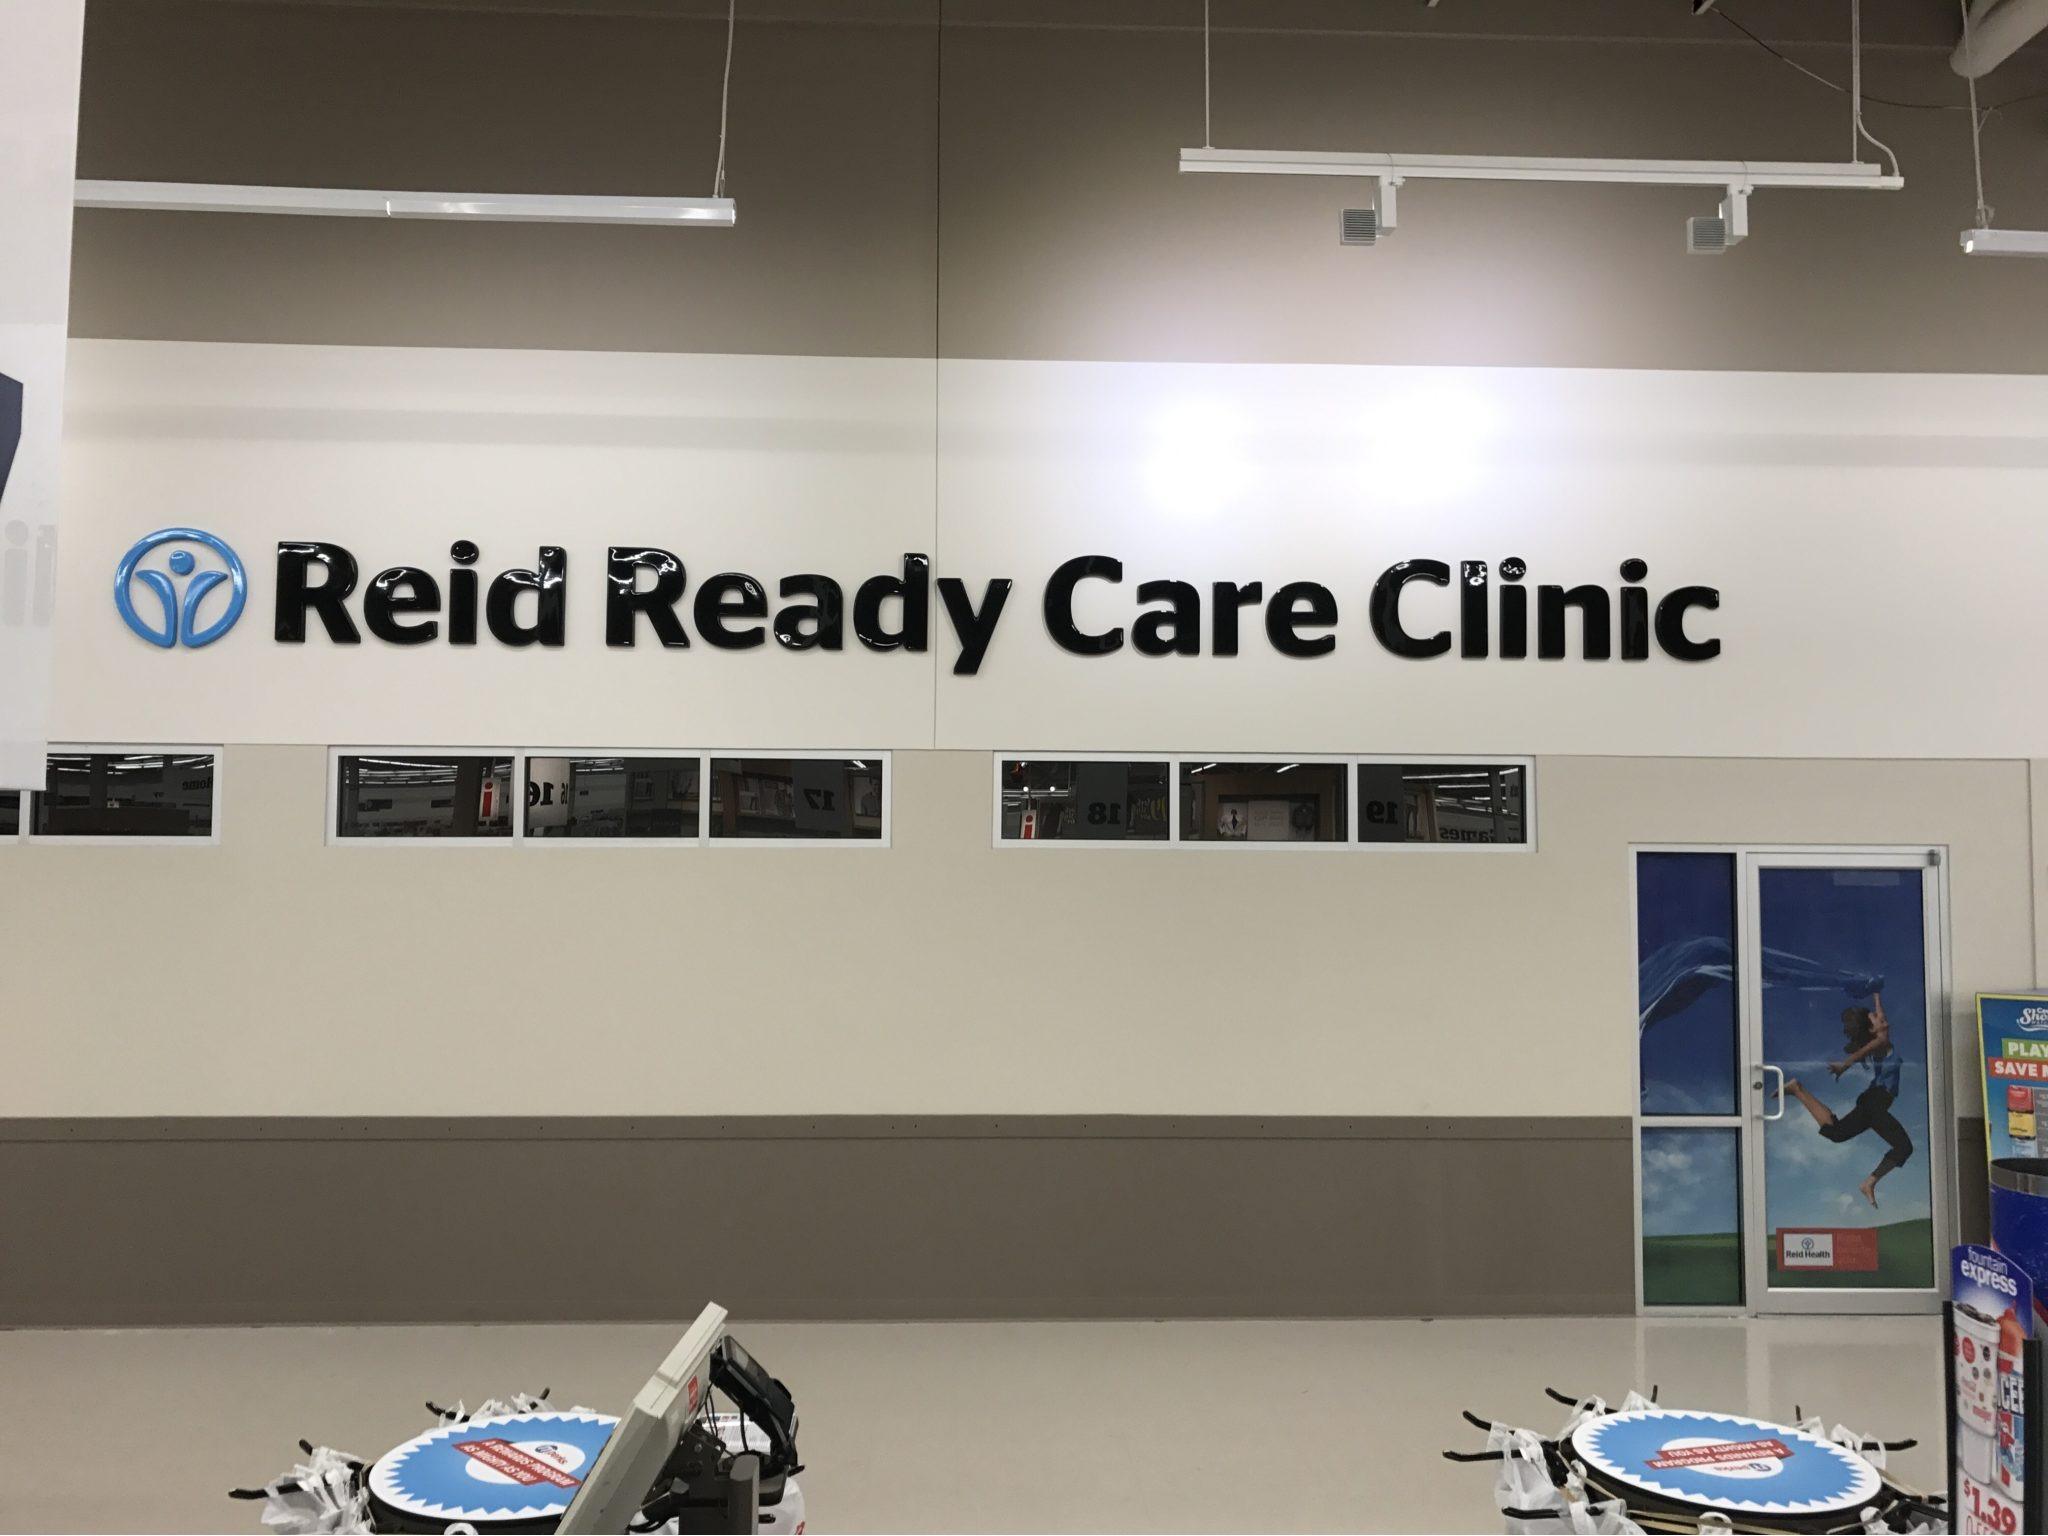 Reid Ready Care Clinic image 1